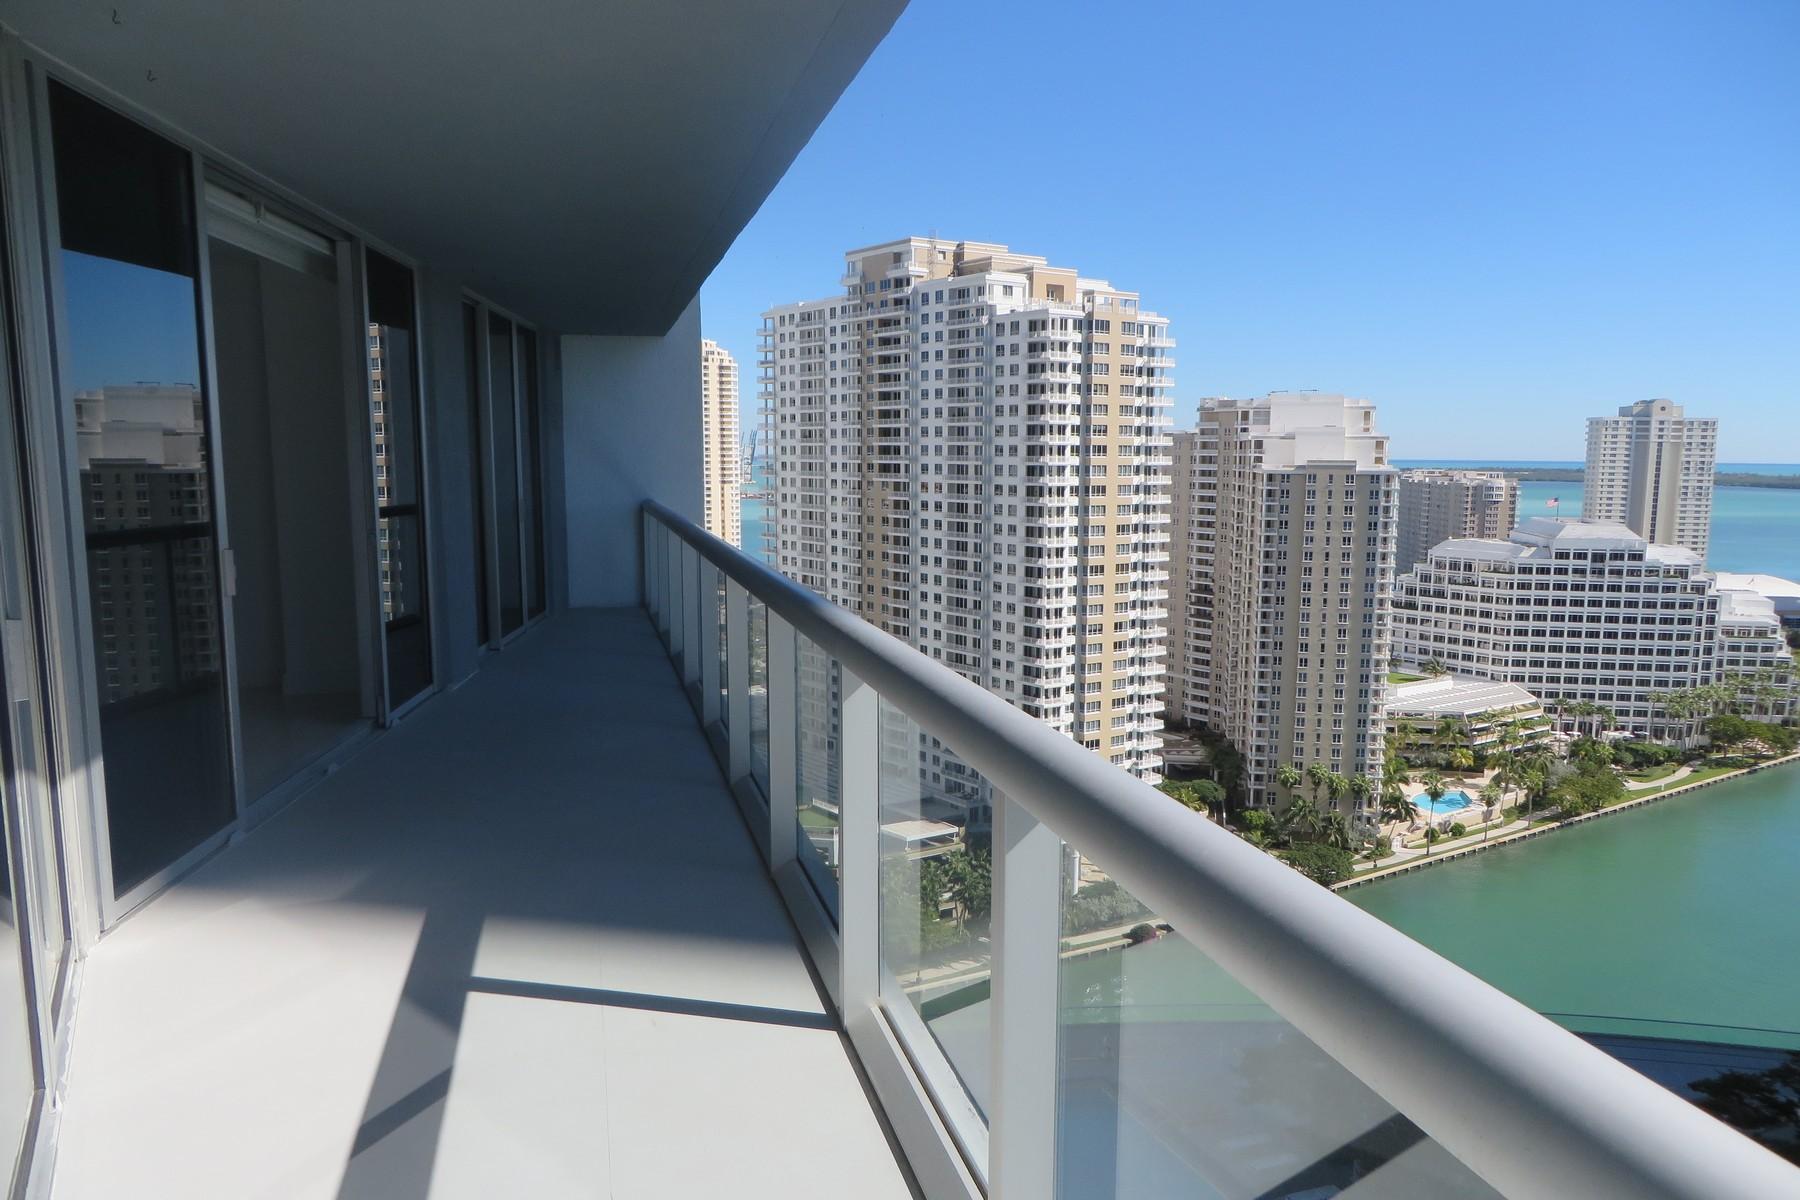 Condominium for Sale at 475 Brickell Ave #2309 475 Brickell Ave 2309 Miami, Florida, 33131 United States